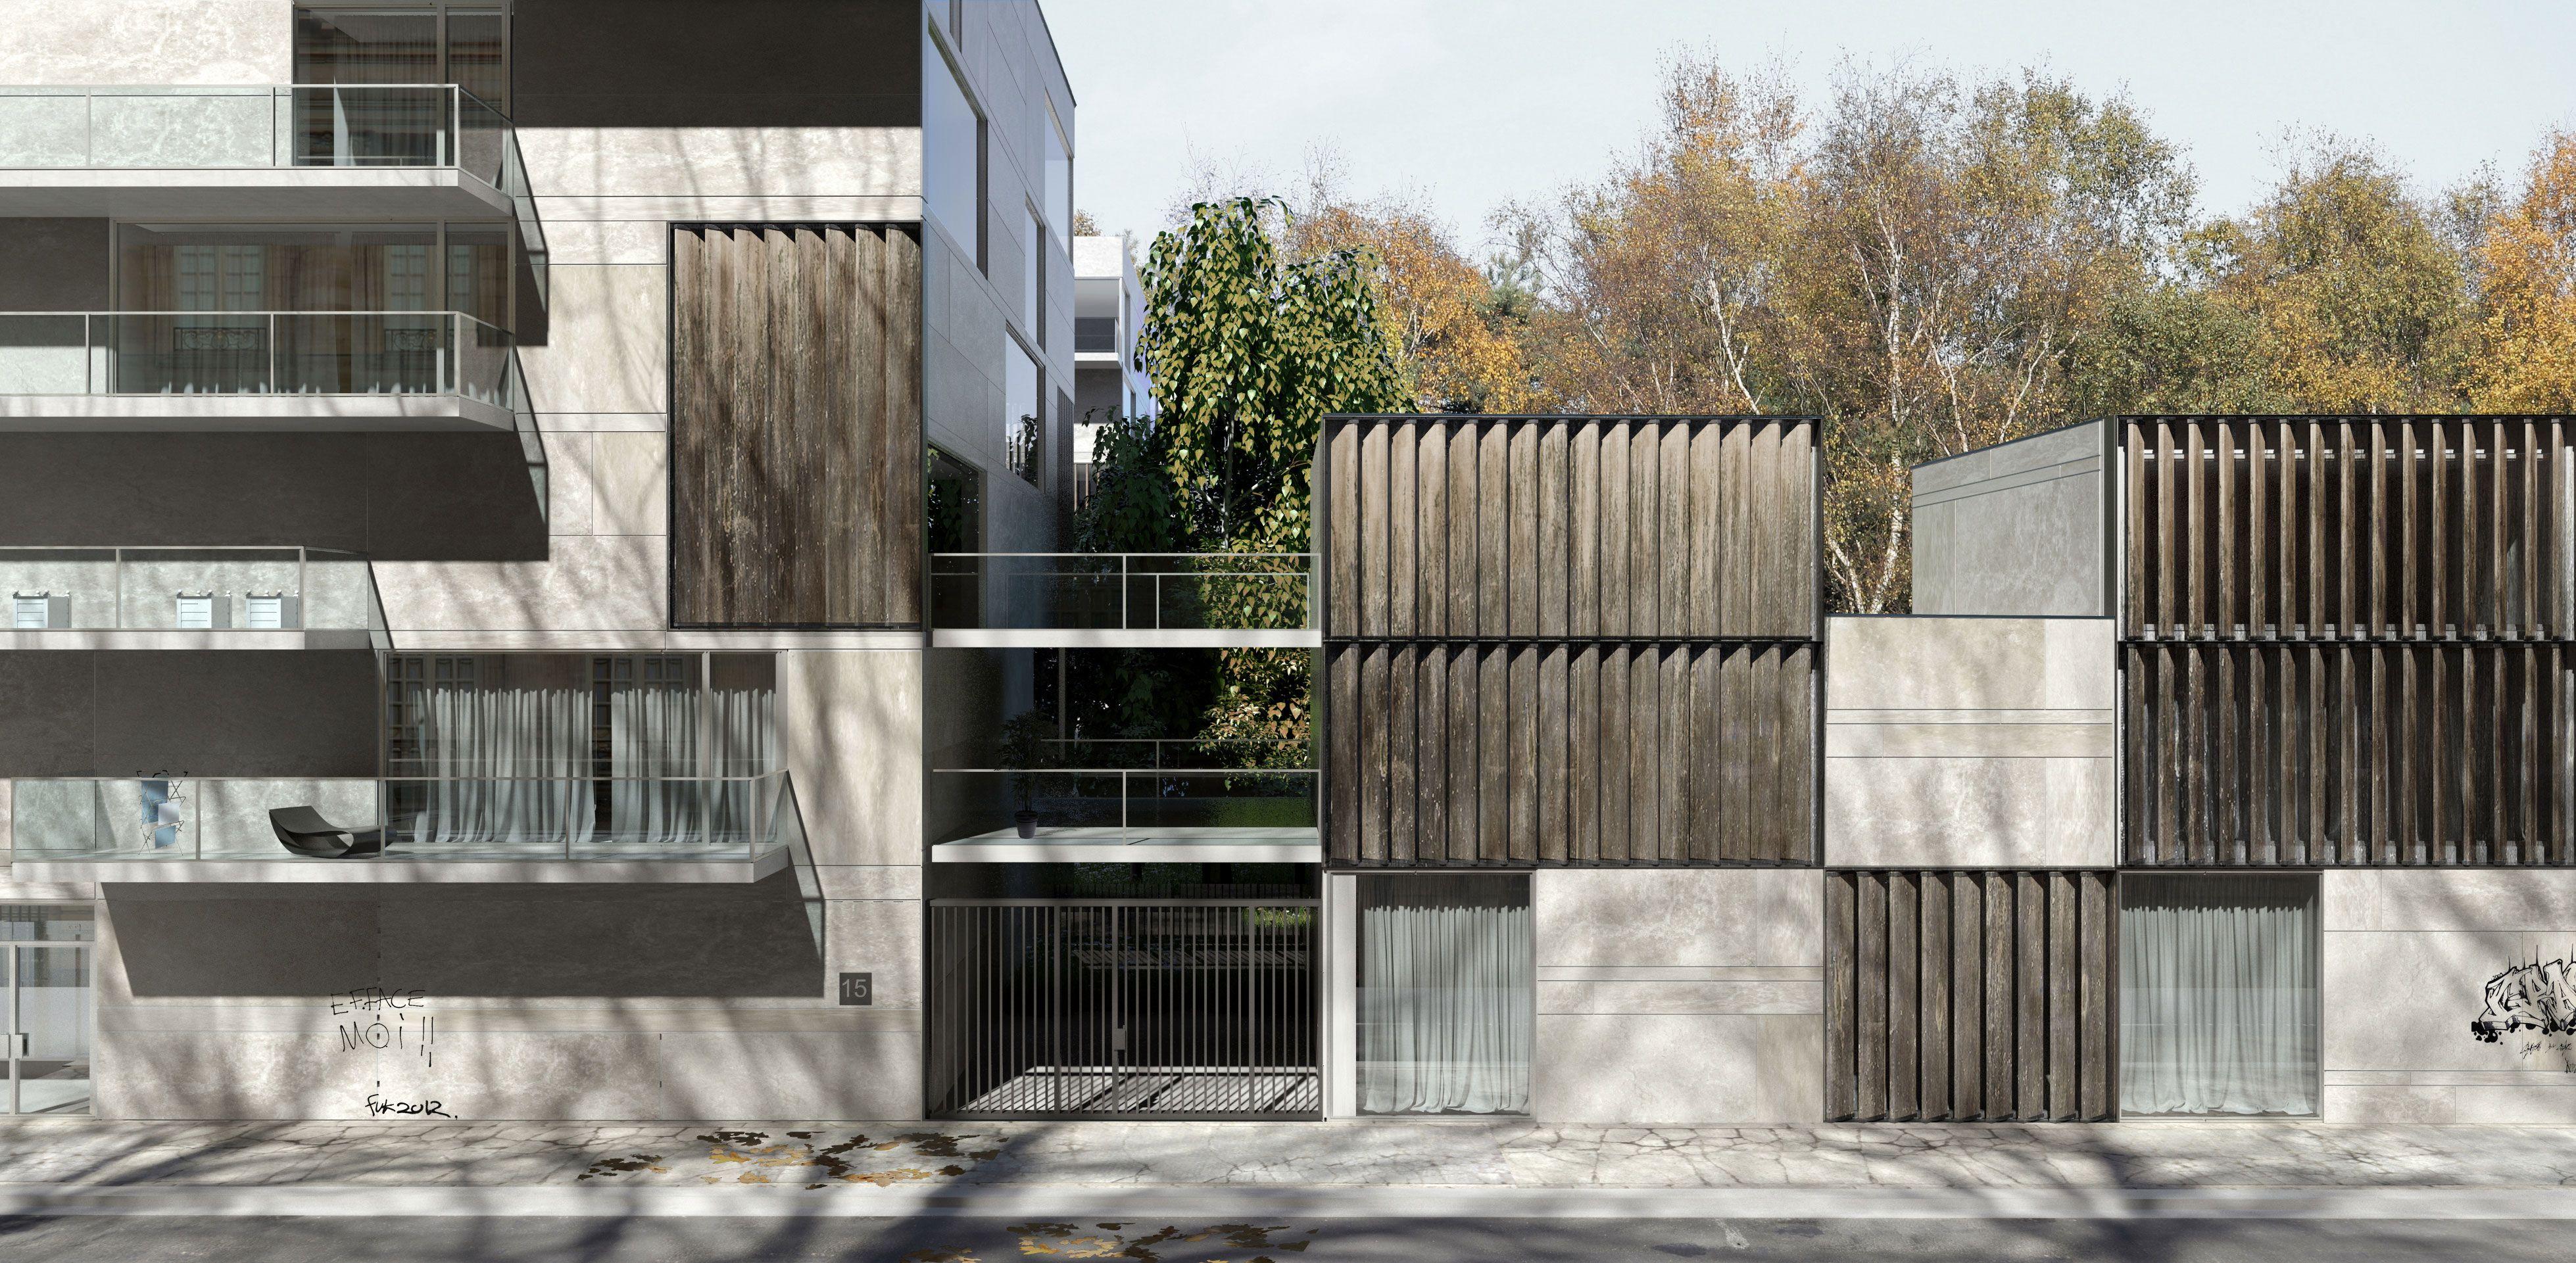 Pierre Minassian | Logements | Pinterest | Facades and Architecture